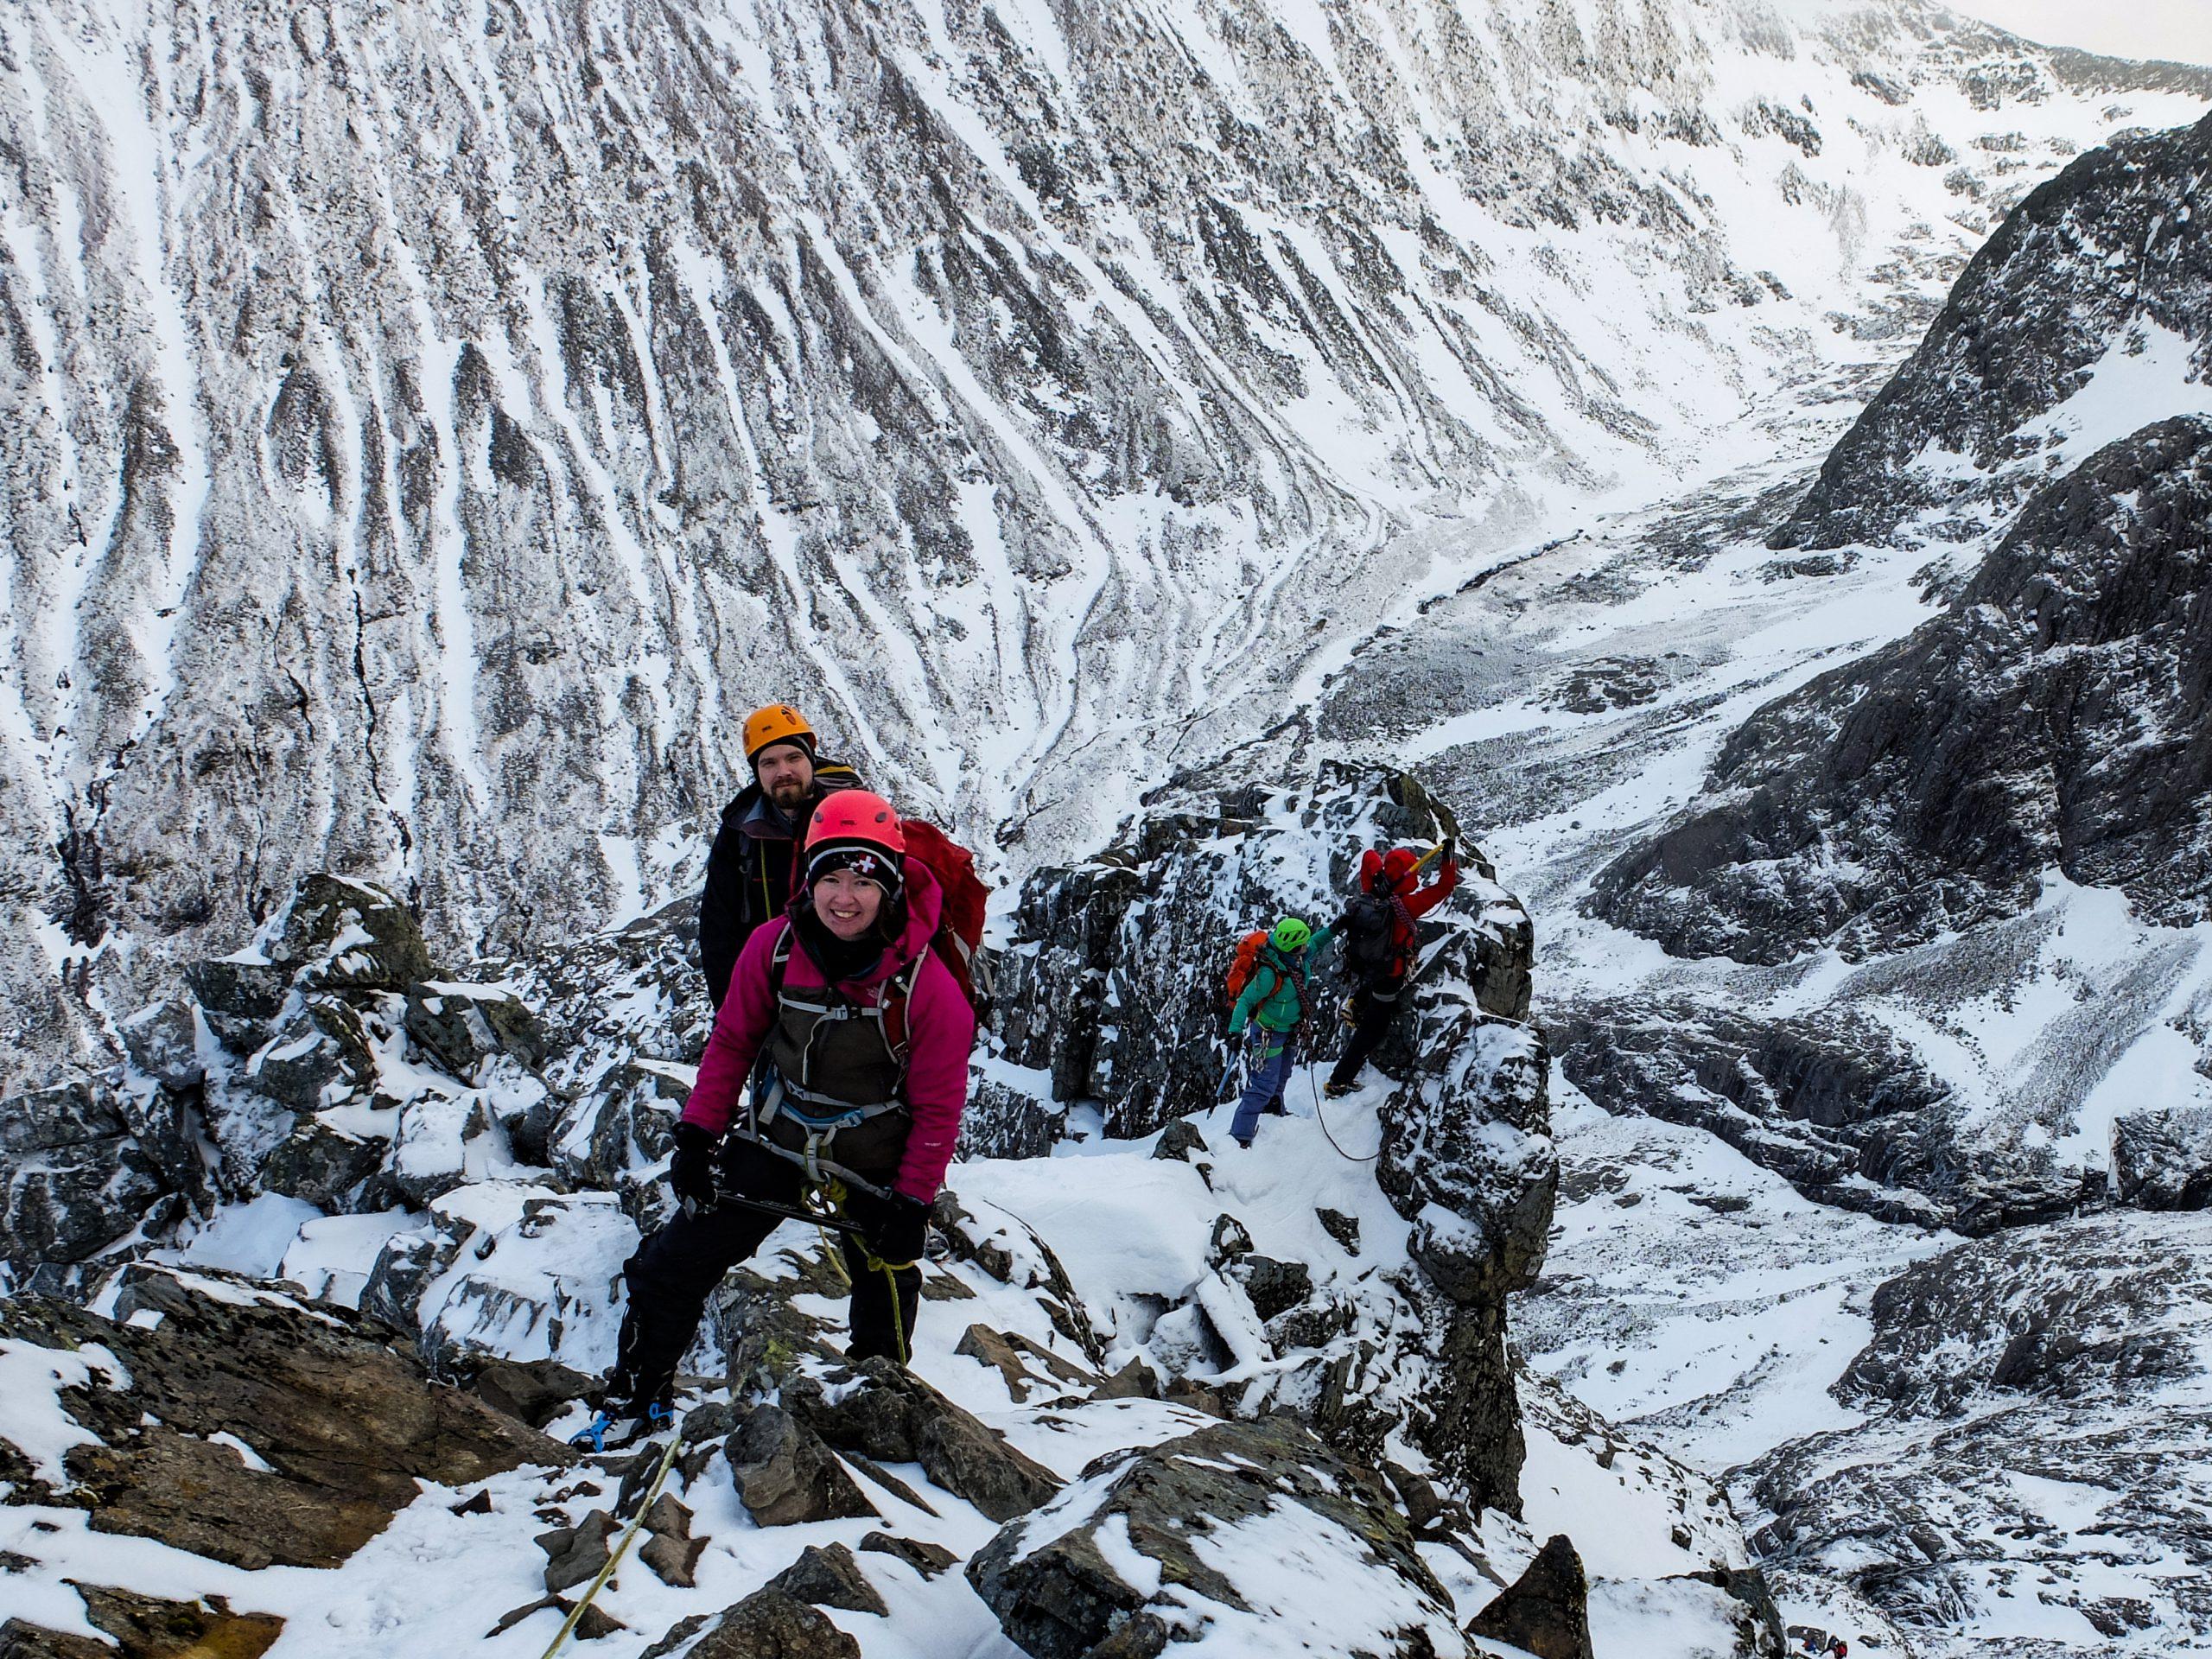 Climbing Ledge Route on Ben Nevis